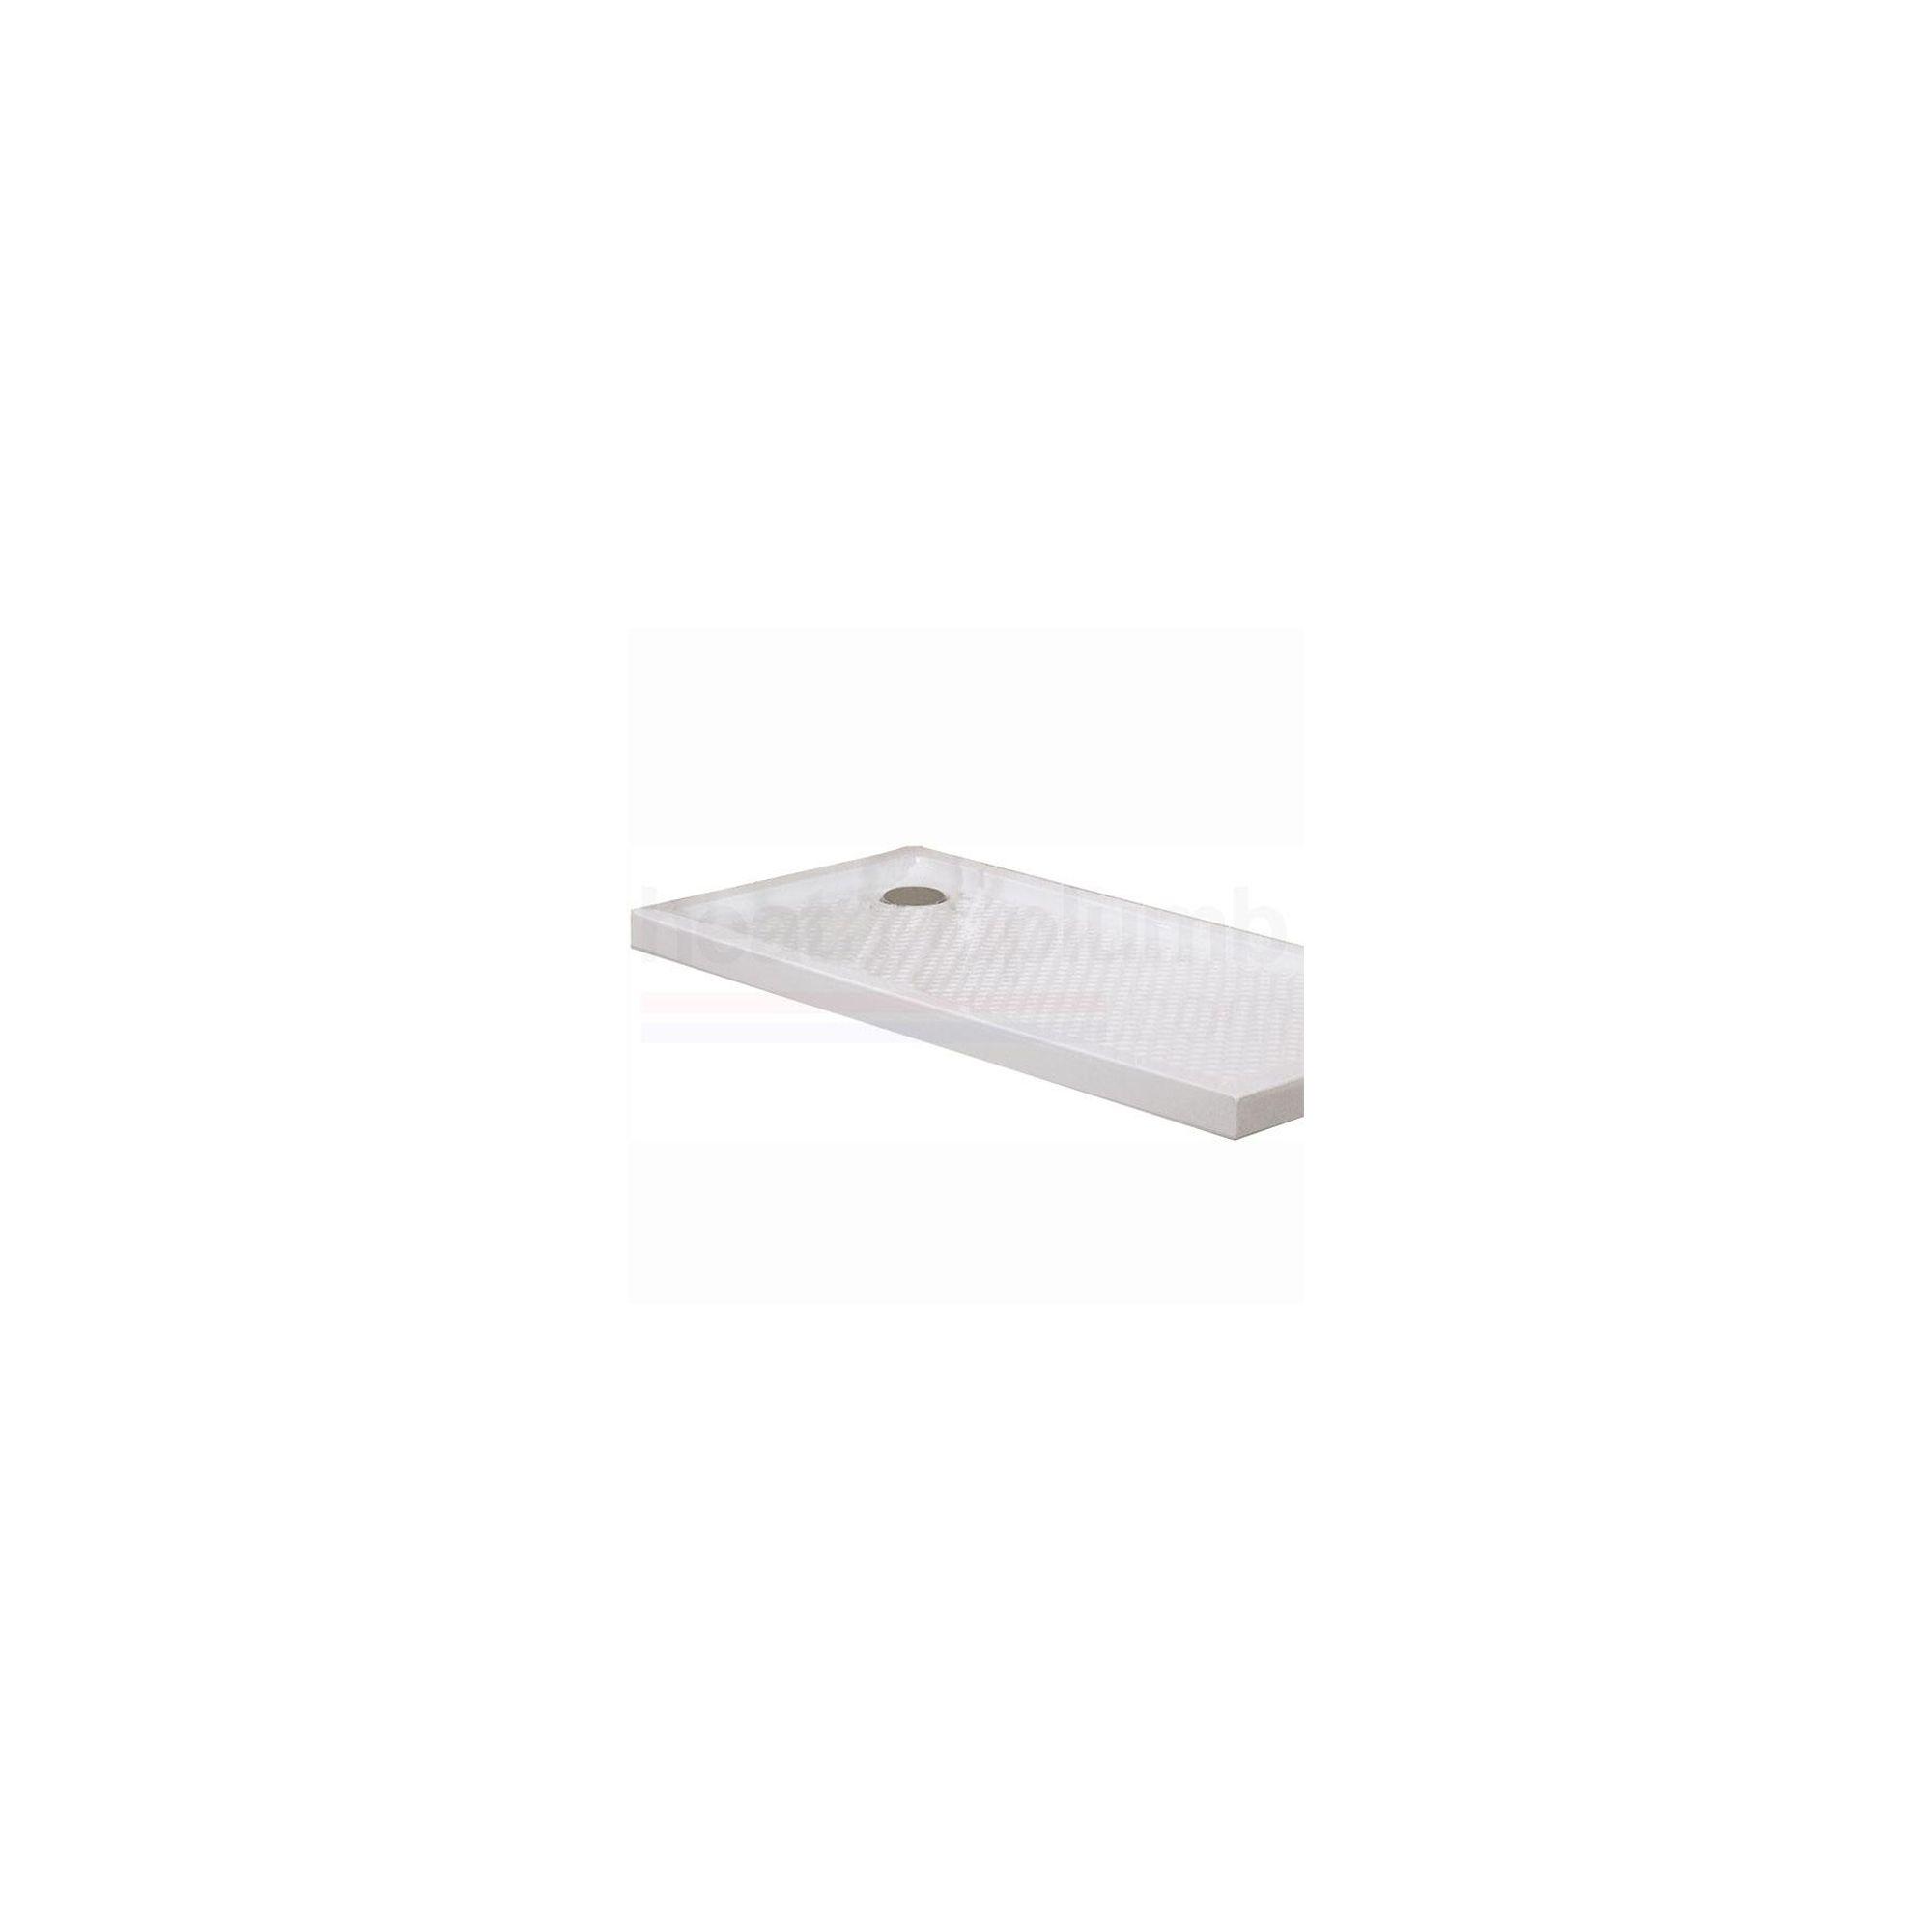 AKW Keppel Rectangular Shower Tray 1300mm x 700mm at Tesco Direct